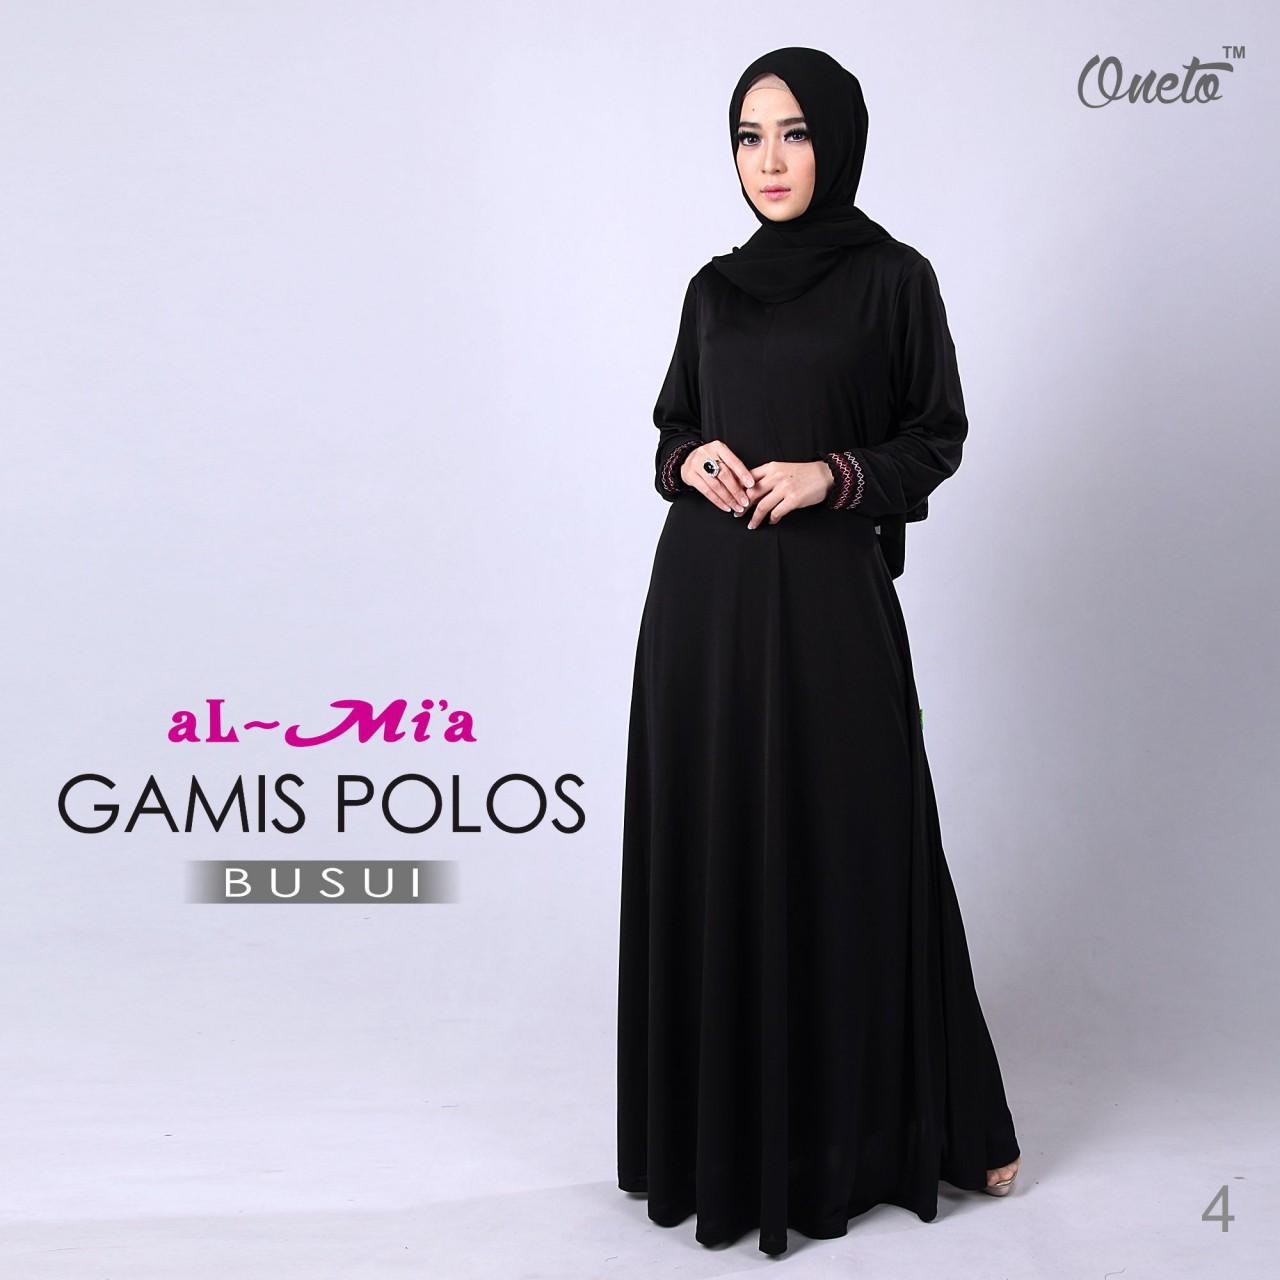 Grammy Ed Model Gamis Polos Dari Kain Katun Jepang